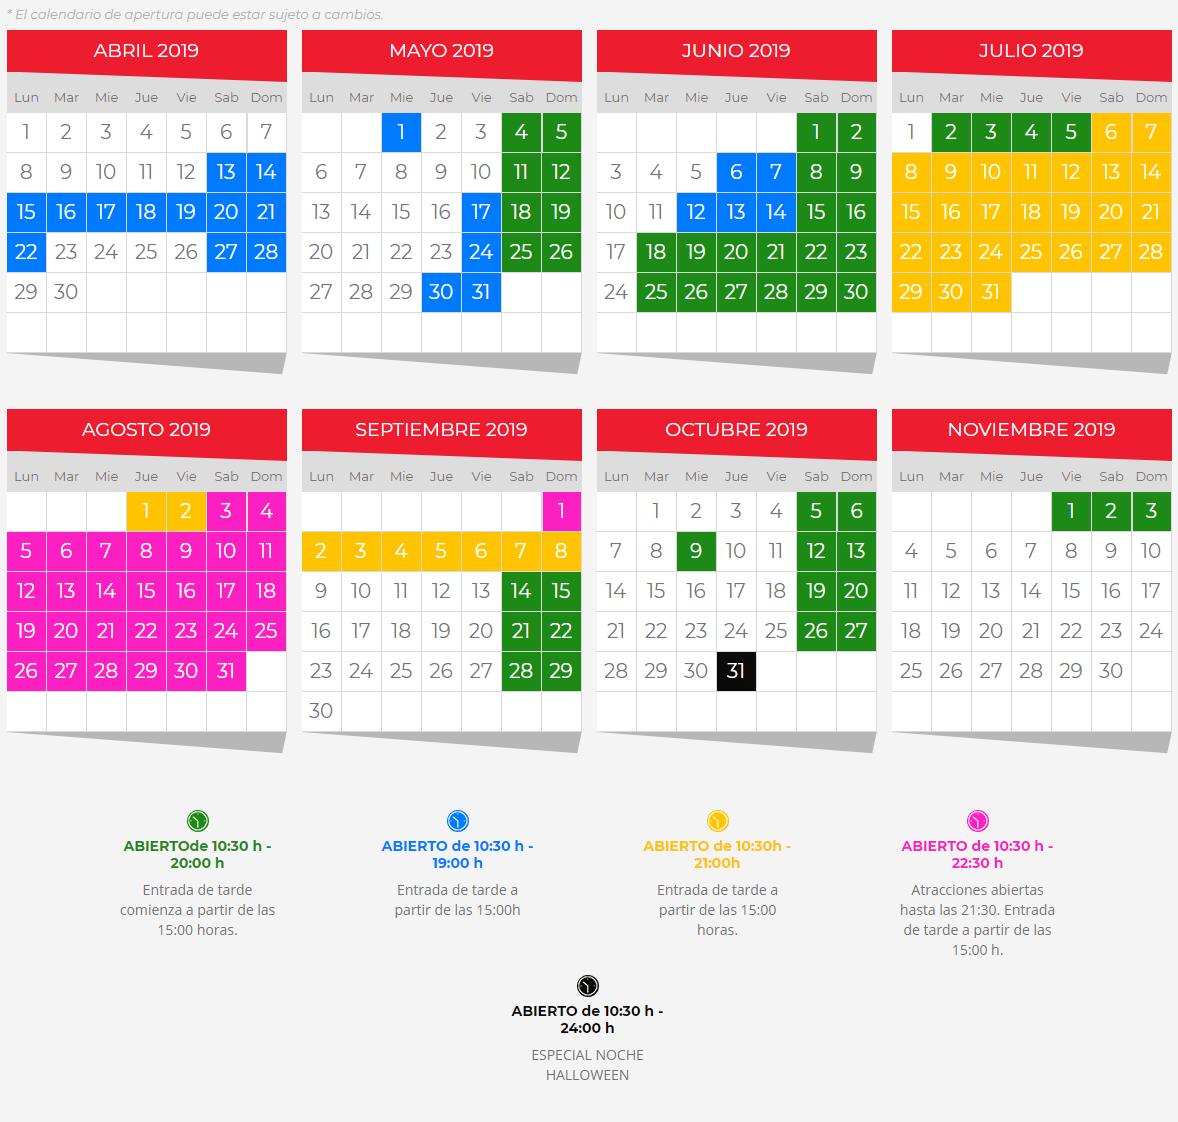 Calendario de Apertura Terra Mítica 2019